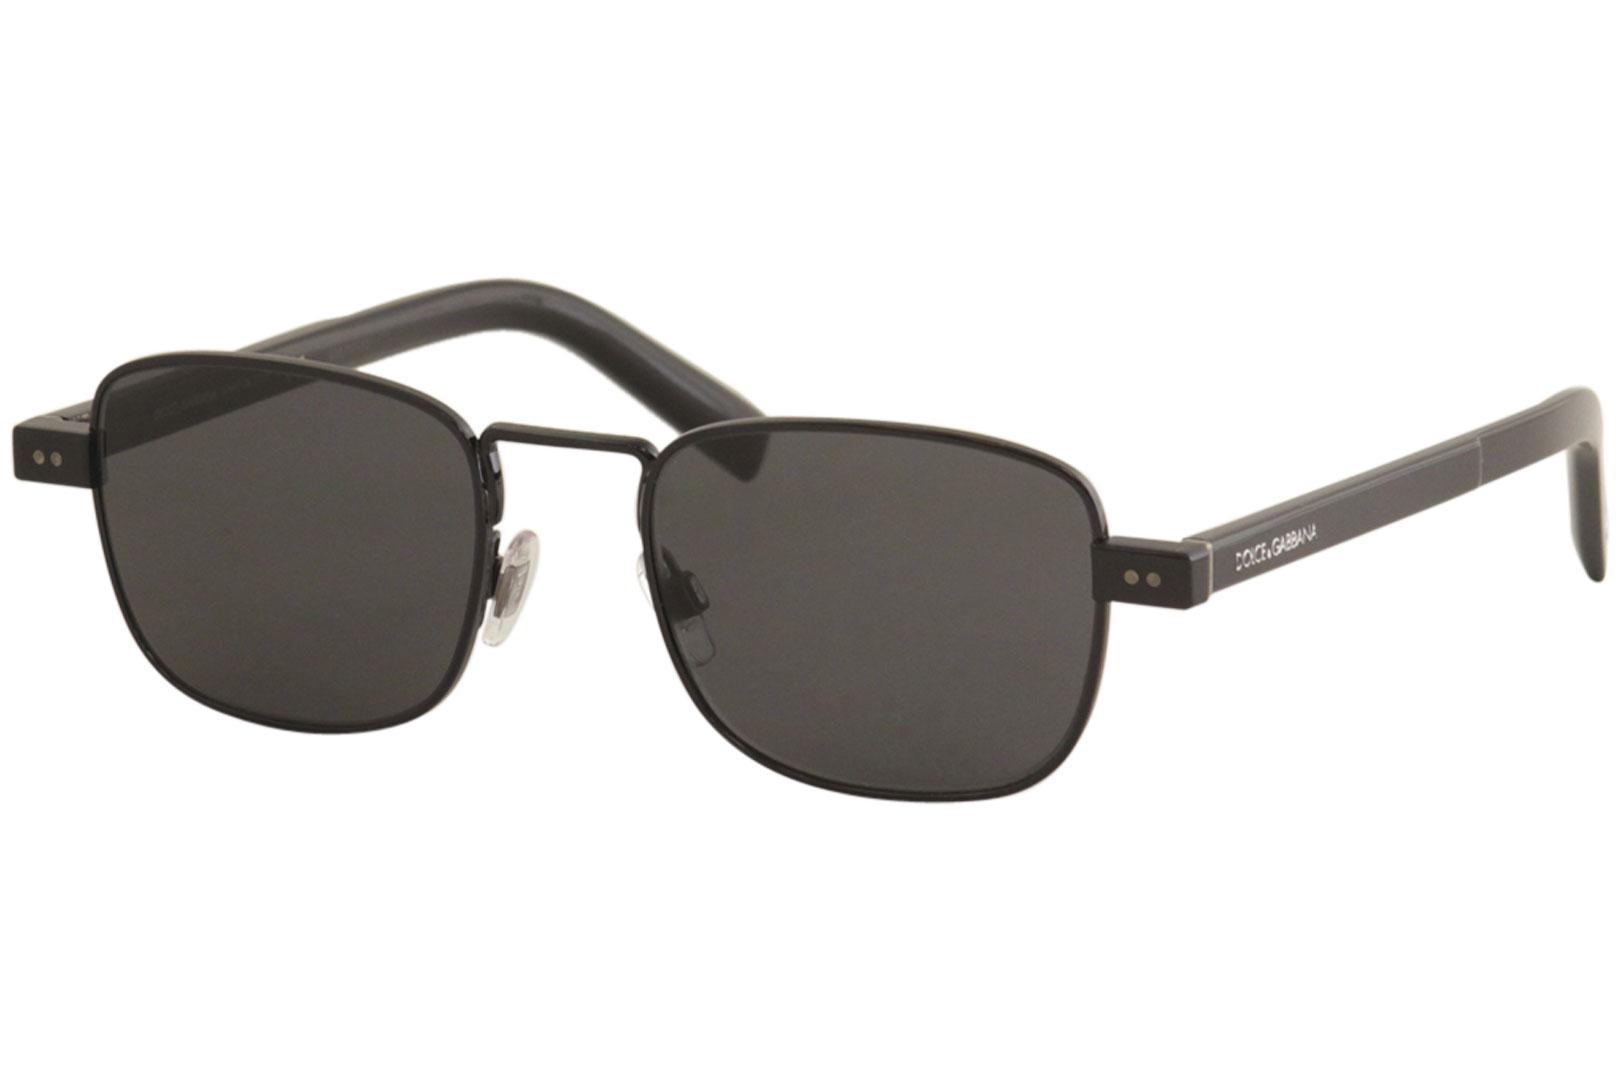 fd1c189cd37c Dolce & Gabbana Men's D&G DG2222 DG/2222 01/87 Black Rectangle ...